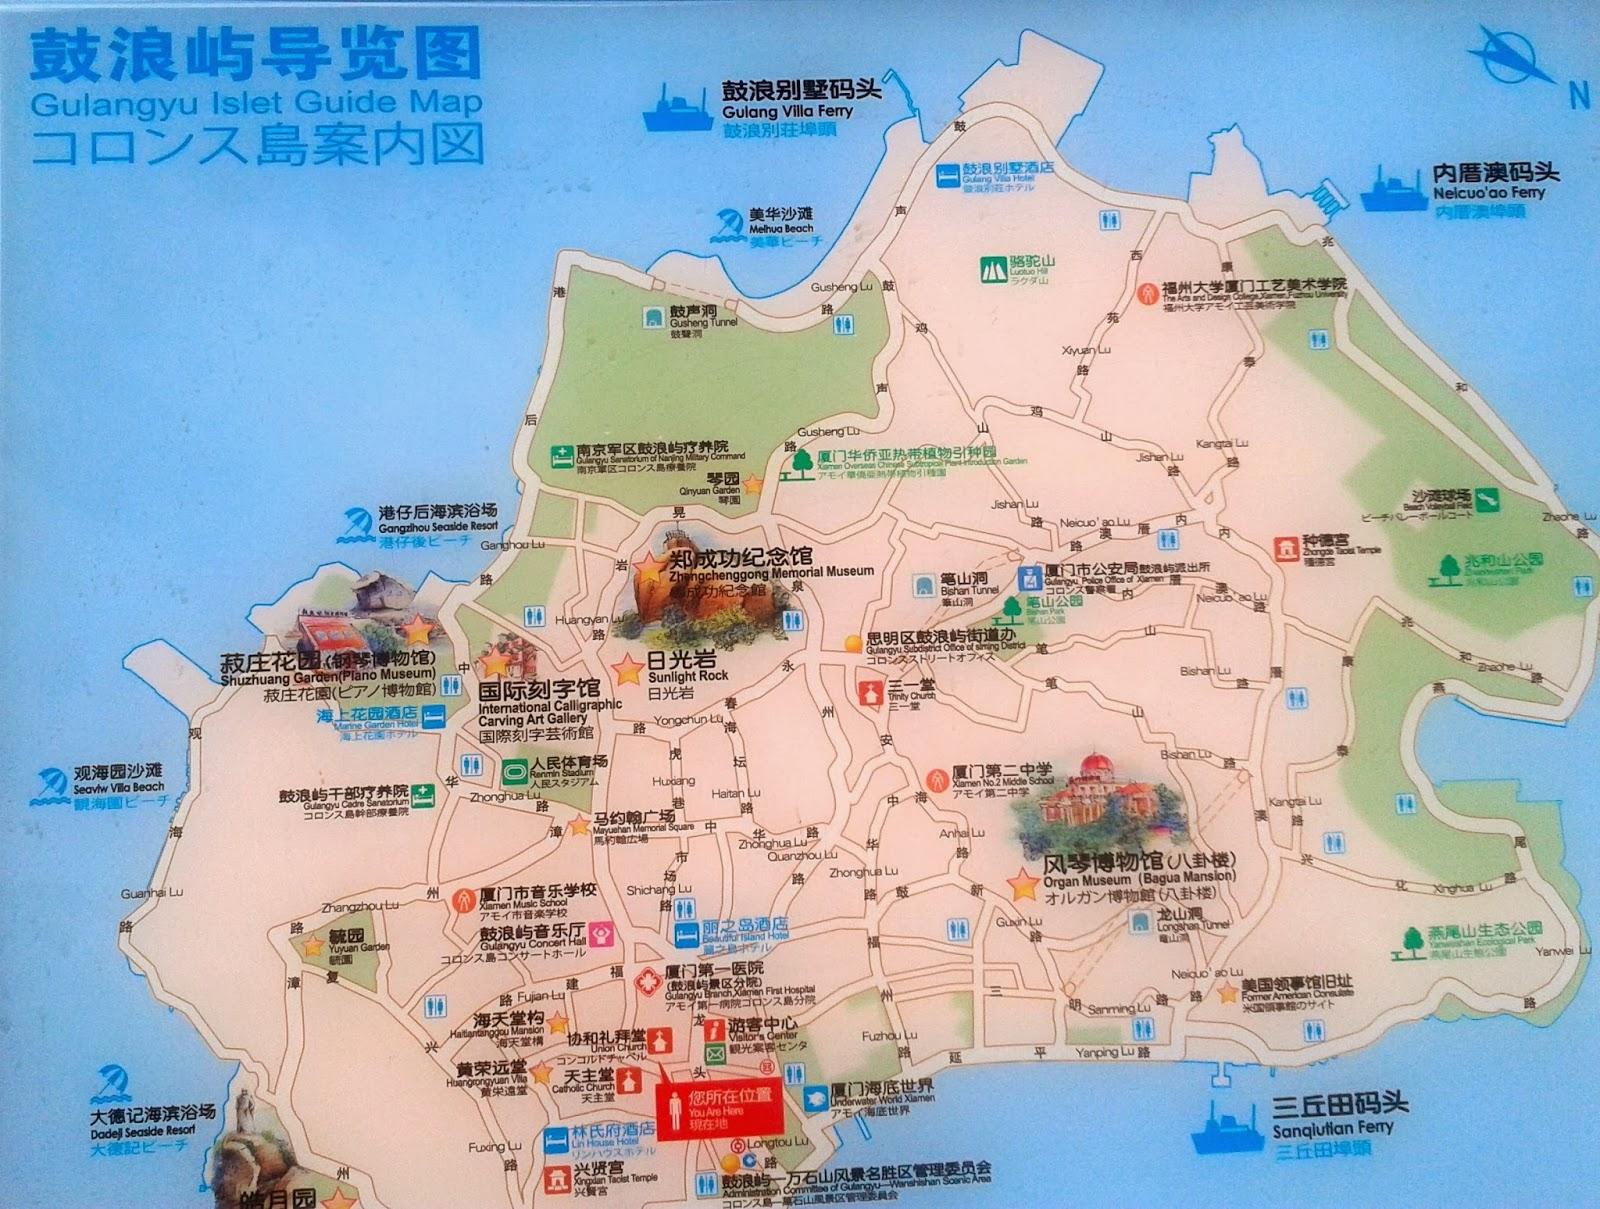 map of gulangyu island